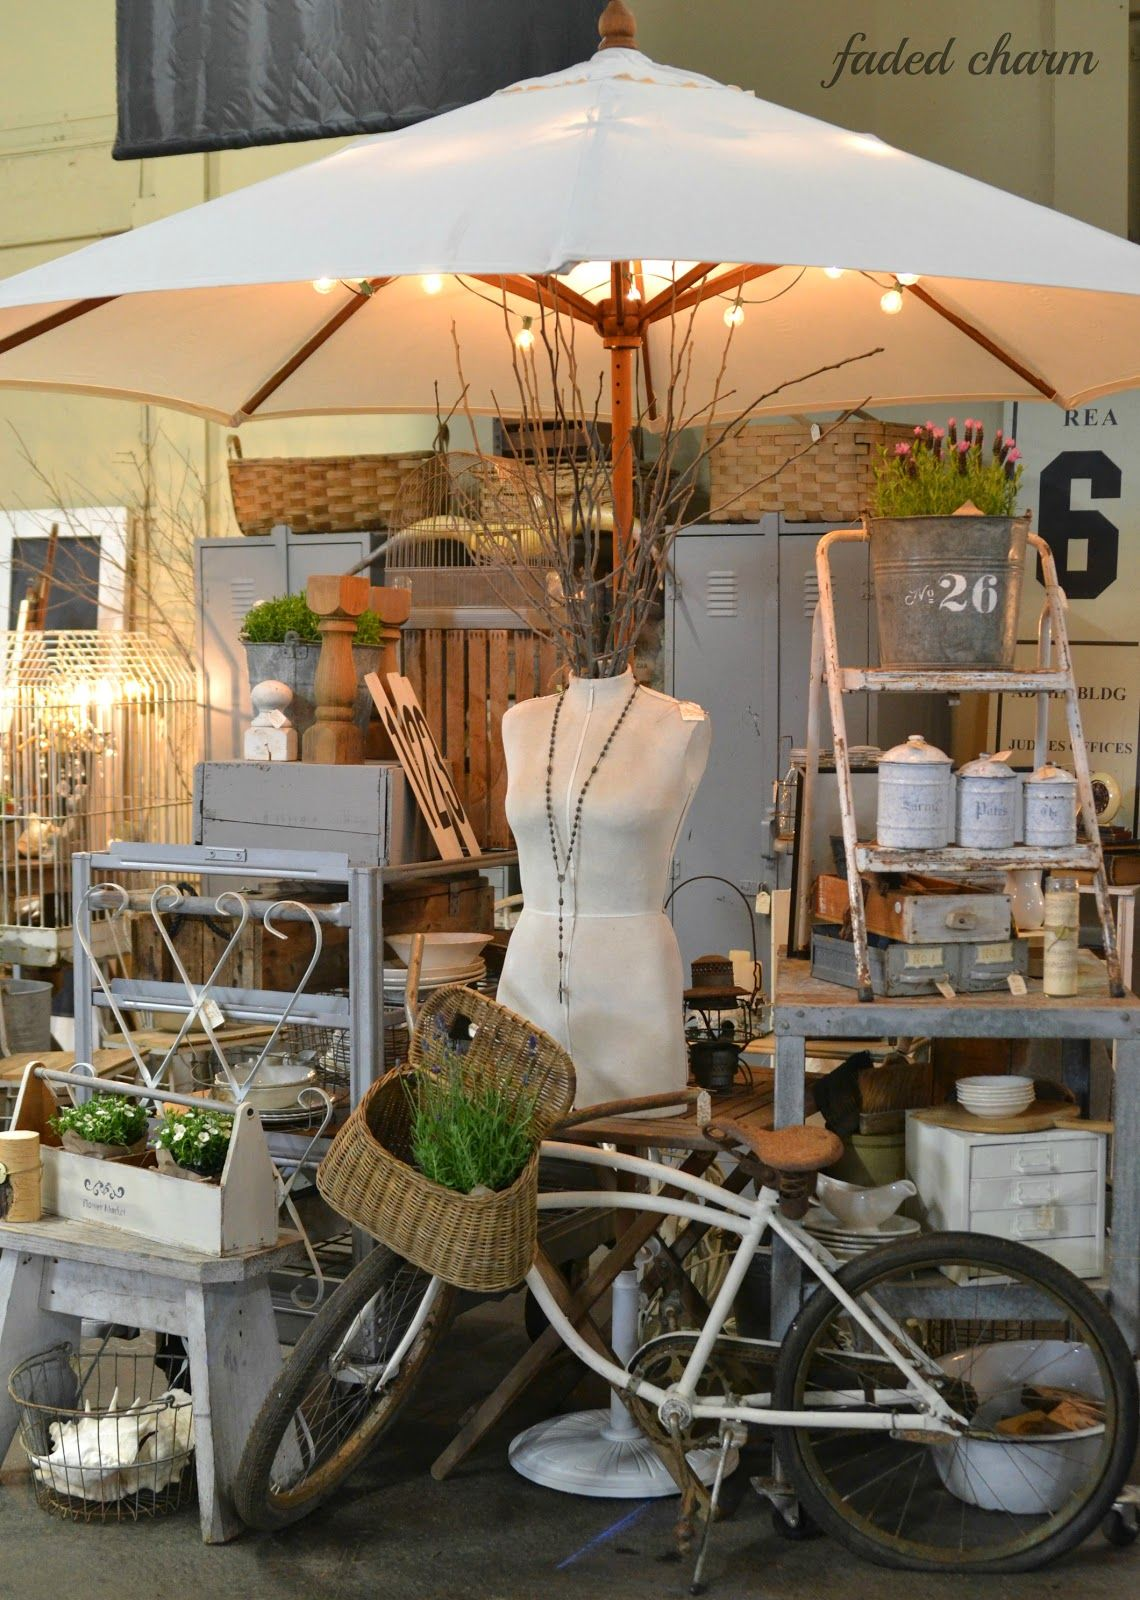 Faded Charm: ~Farm & Frills Show~  Umbrella great idea for the booth #largeumbrella